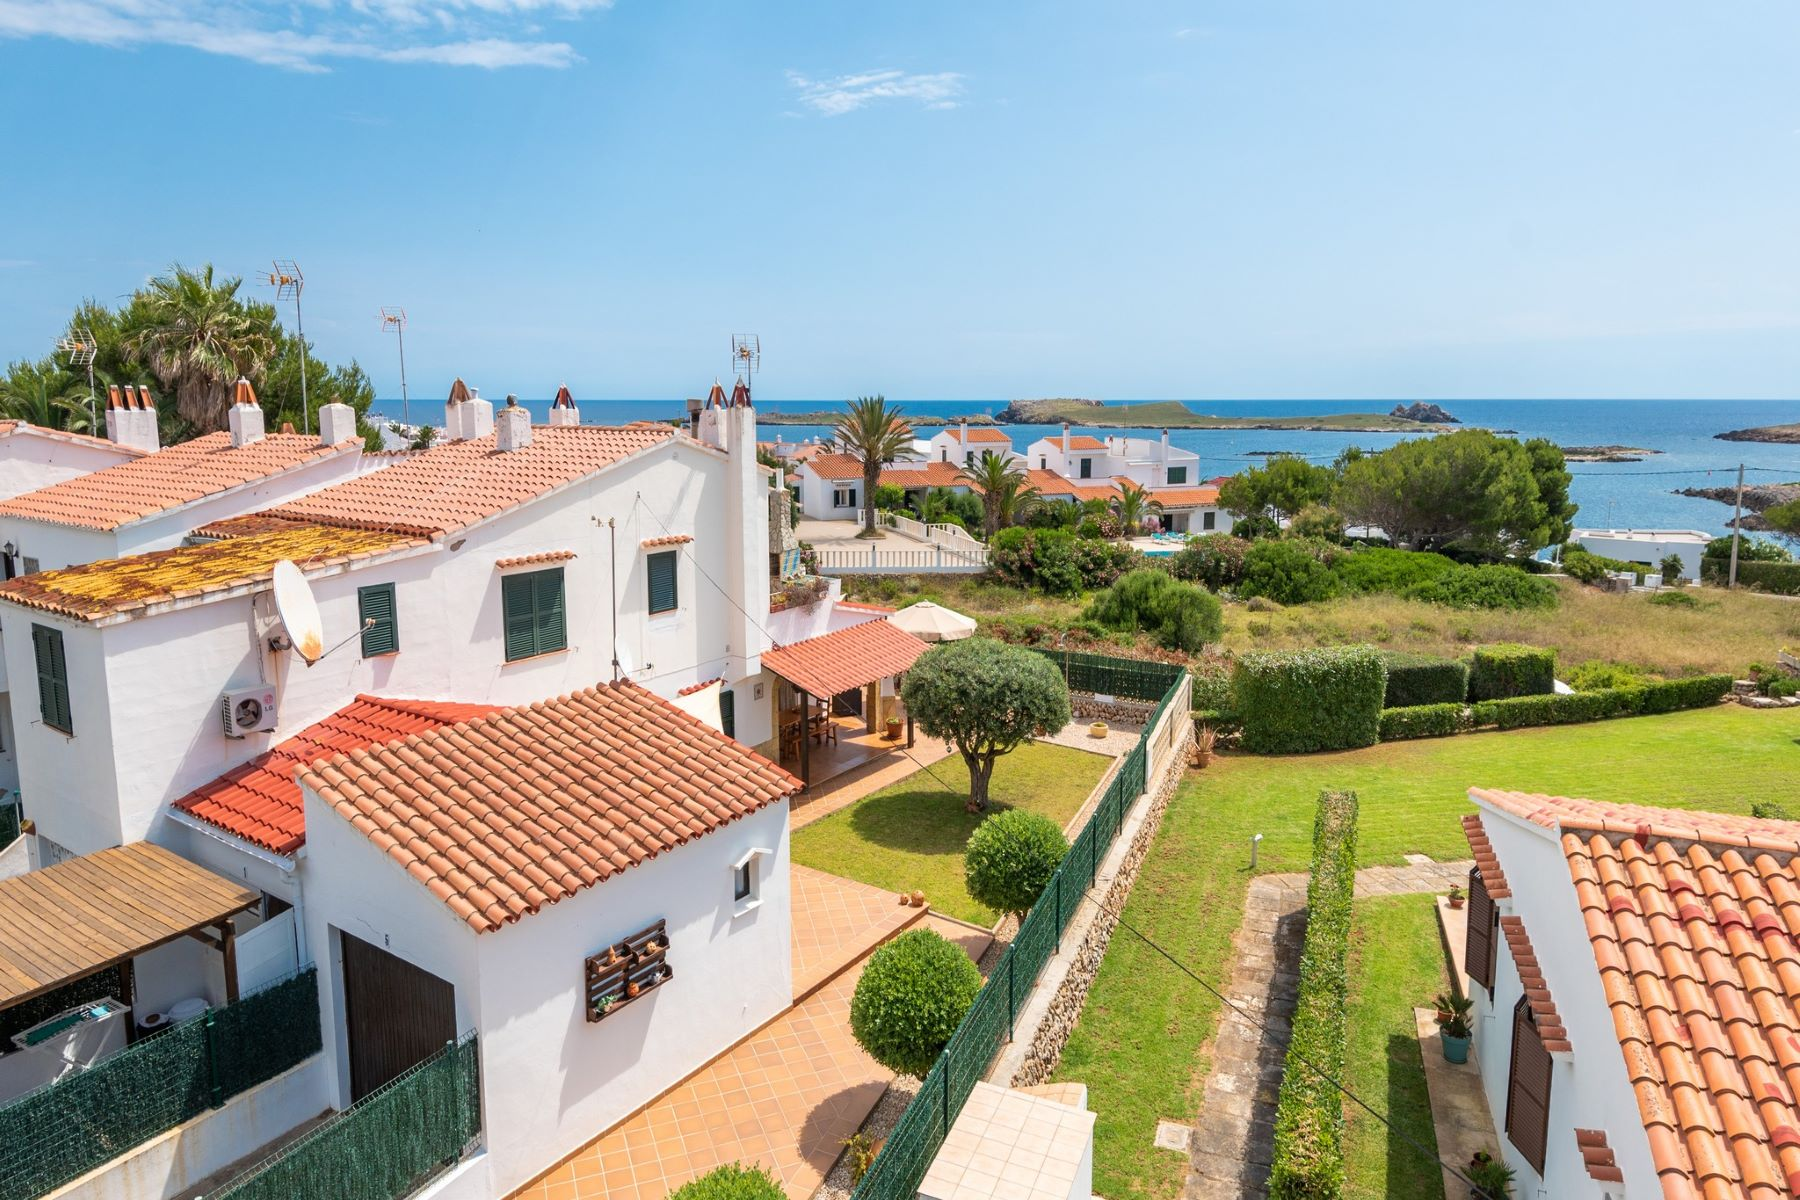 Single Family Homes for Sale at Charming beach house Menorca, Menorca Spain